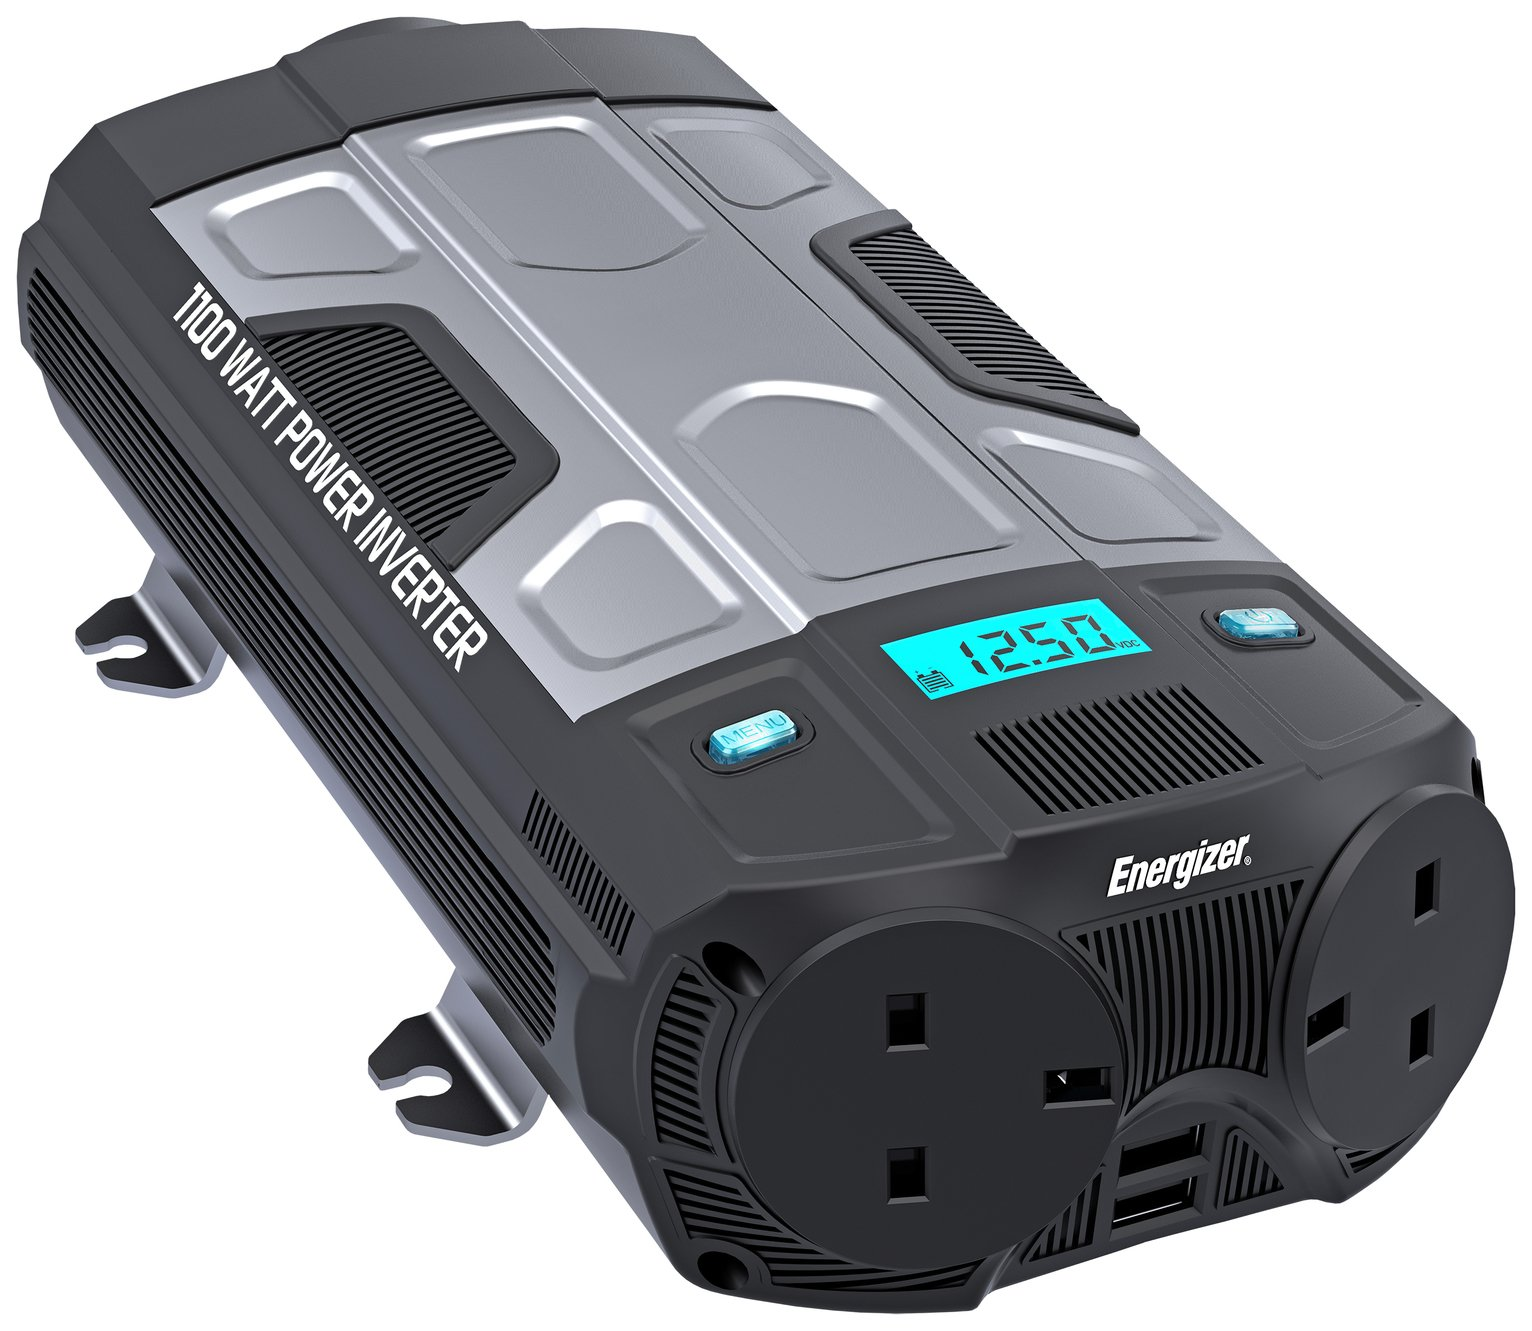 Energizer 1100W Power Inverter